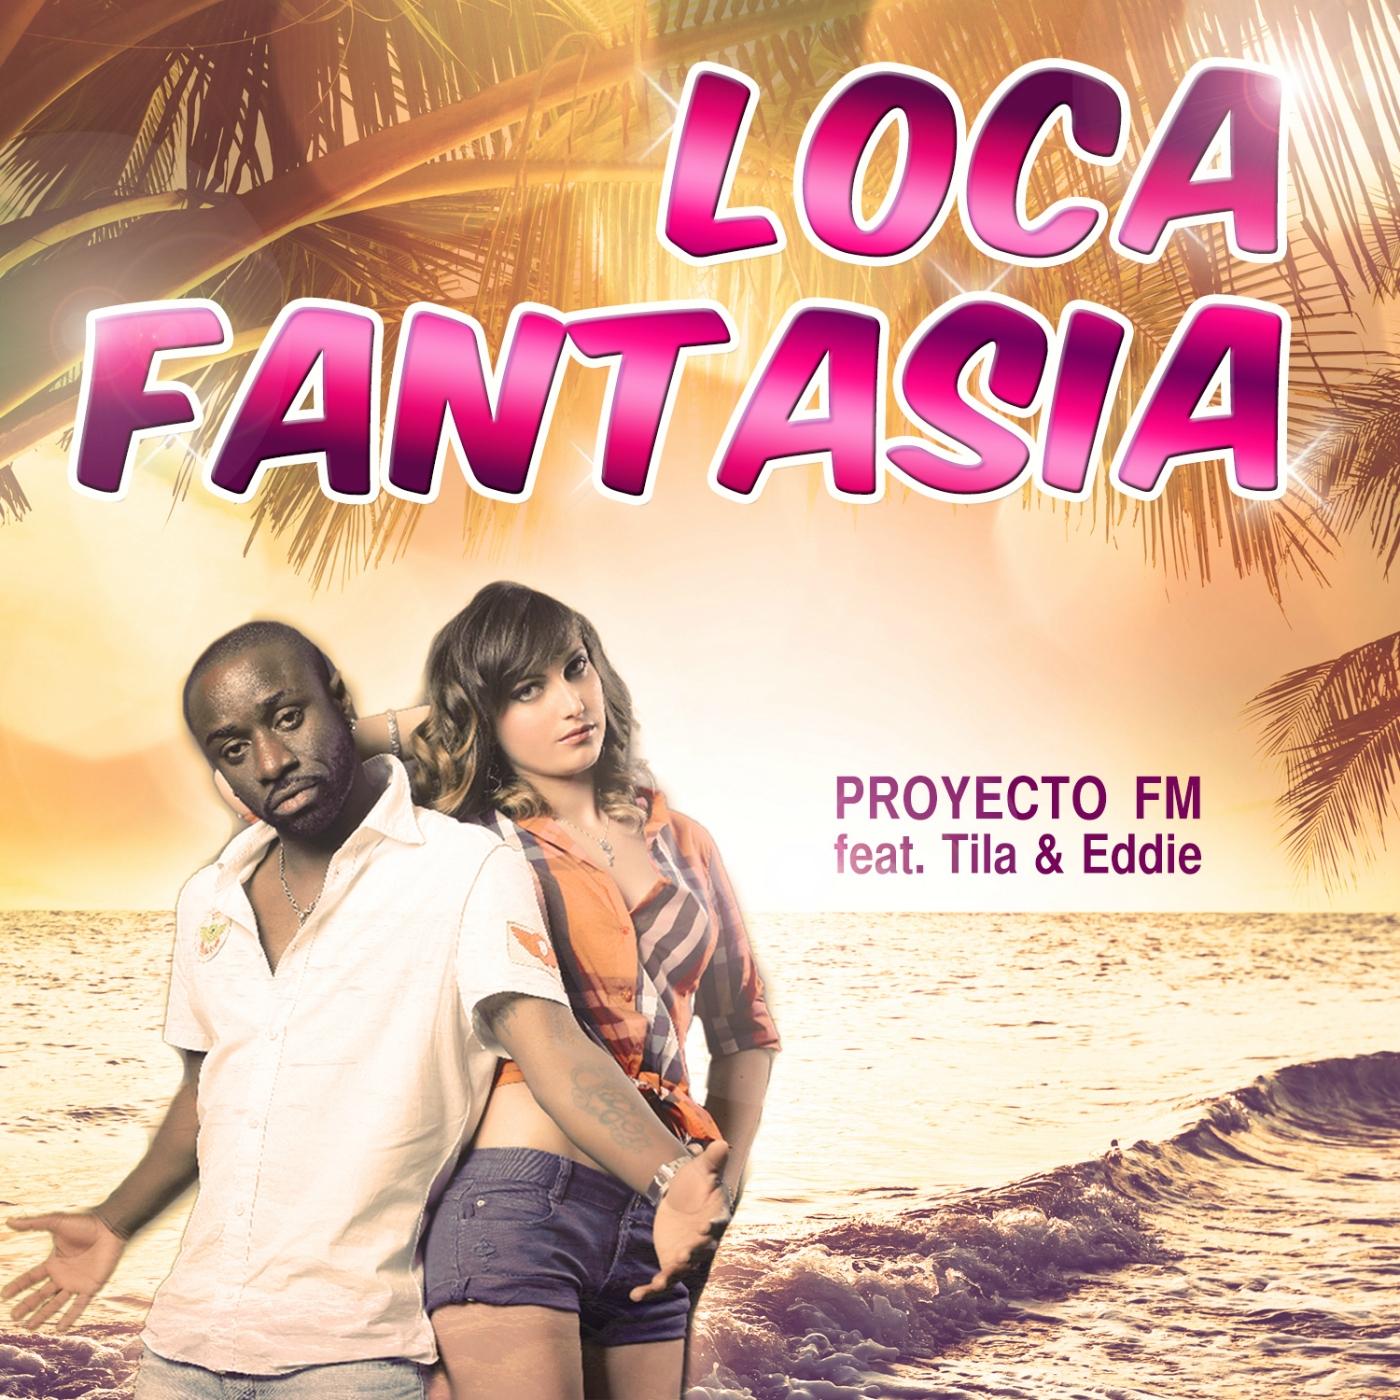 Proyecto FM - Loca Fantasia Feat. Tila & Eddie (Fabio De Venere Bachata Mix)